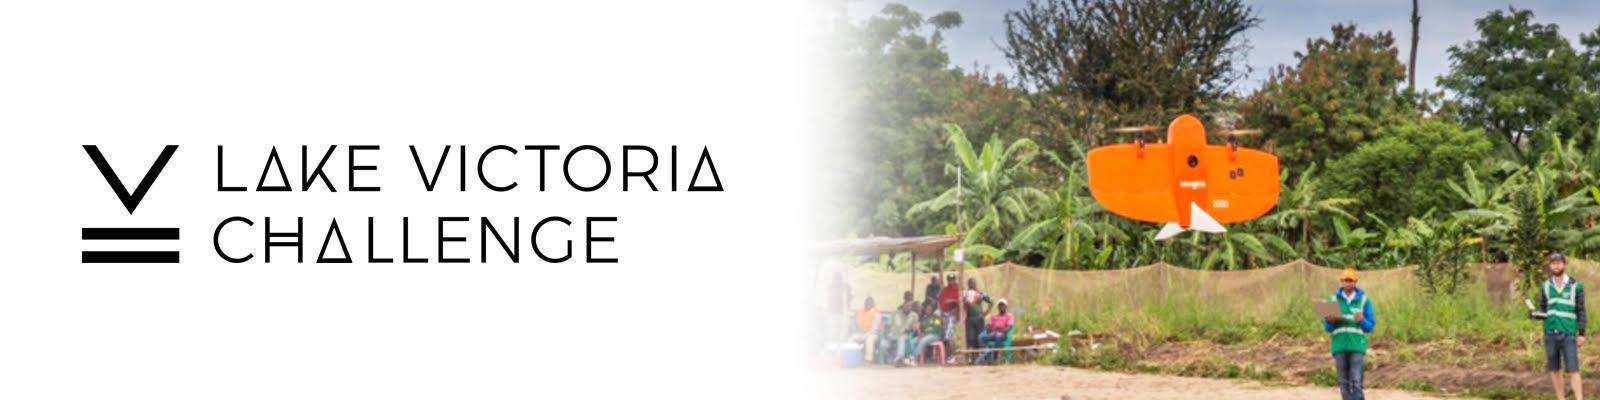 lake victoria challenge main event page logo